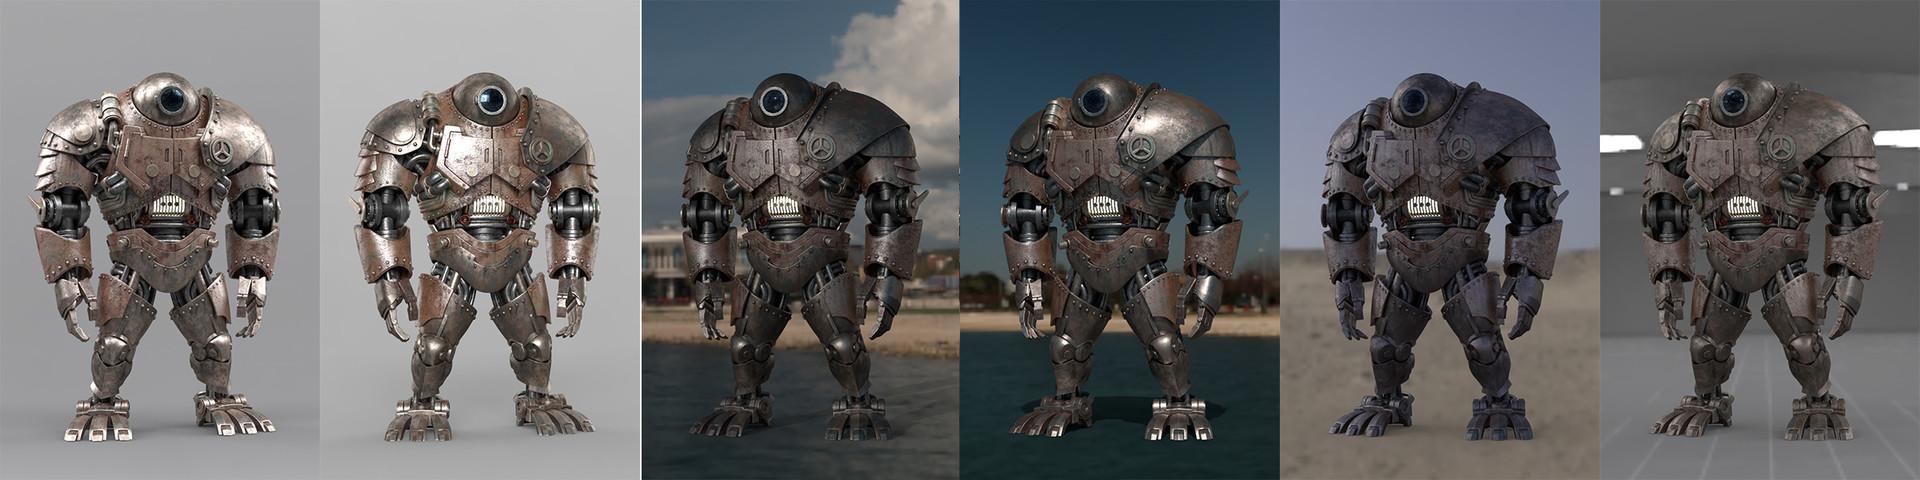 Carlos vidal baconandhams robot